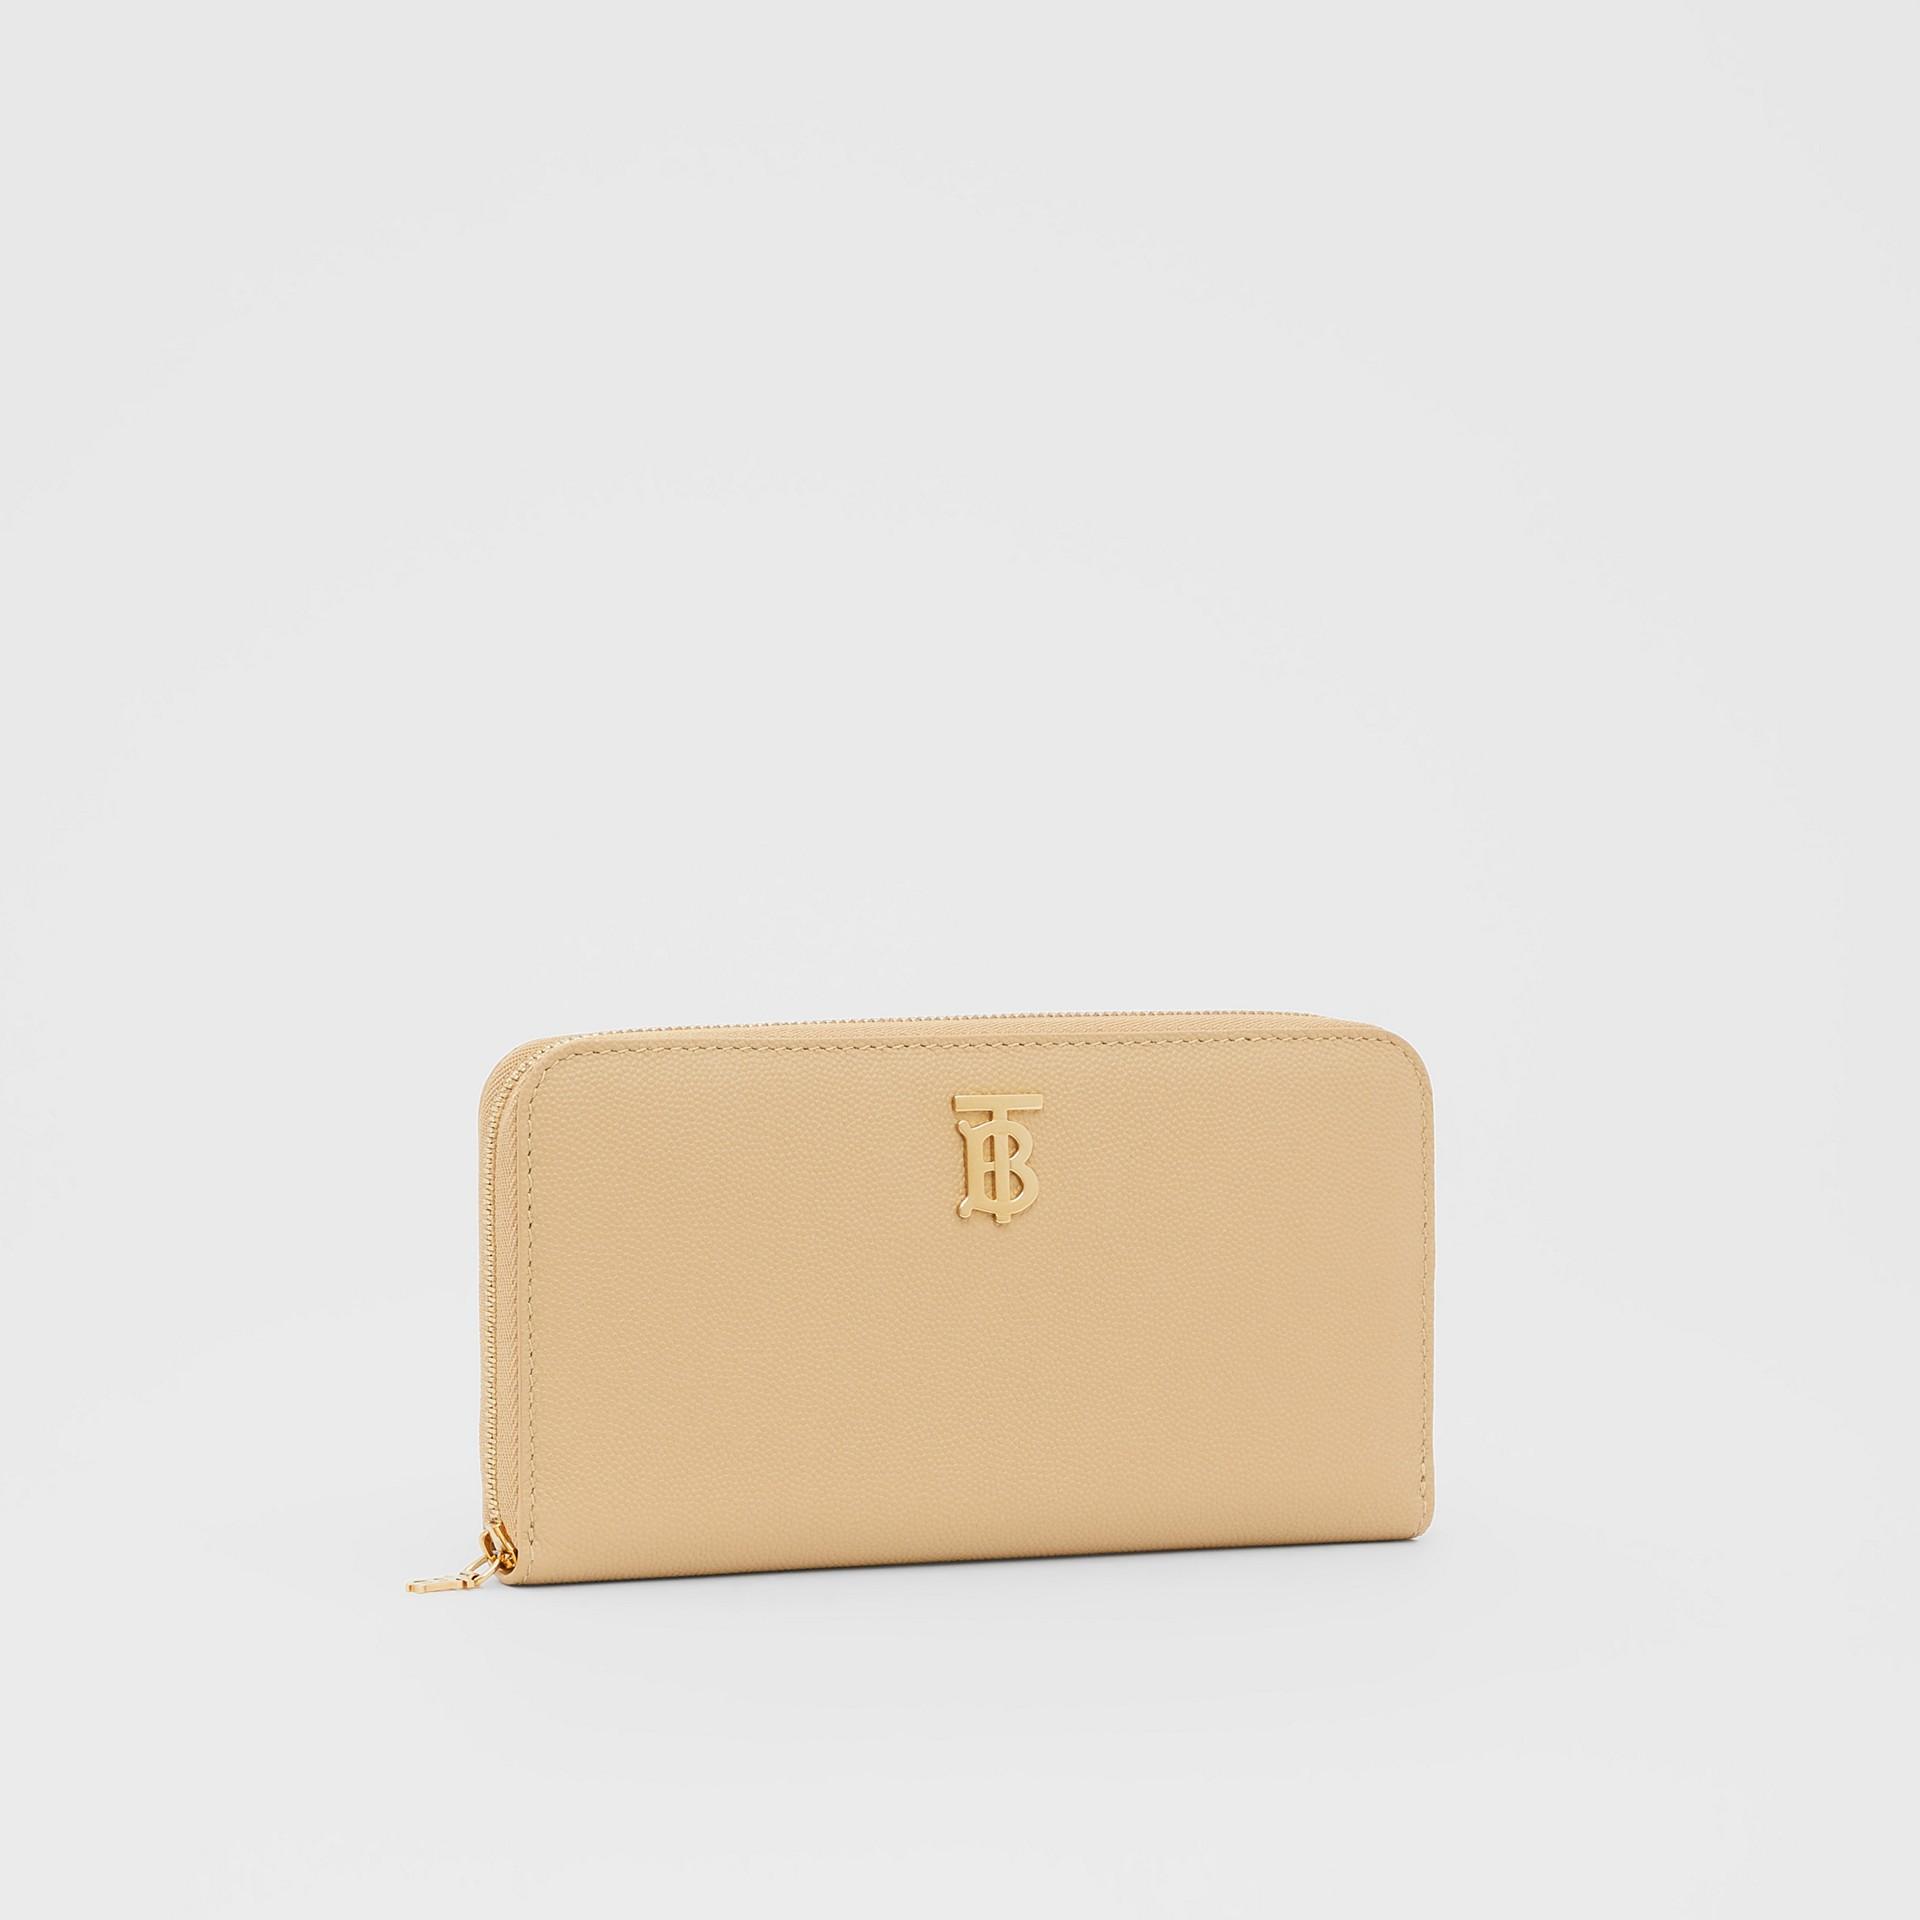 Monogram Motif Grainy Leather Ziparound Wallet in Archive Beige - Women | Burberry United Kingdom - gallery image 4